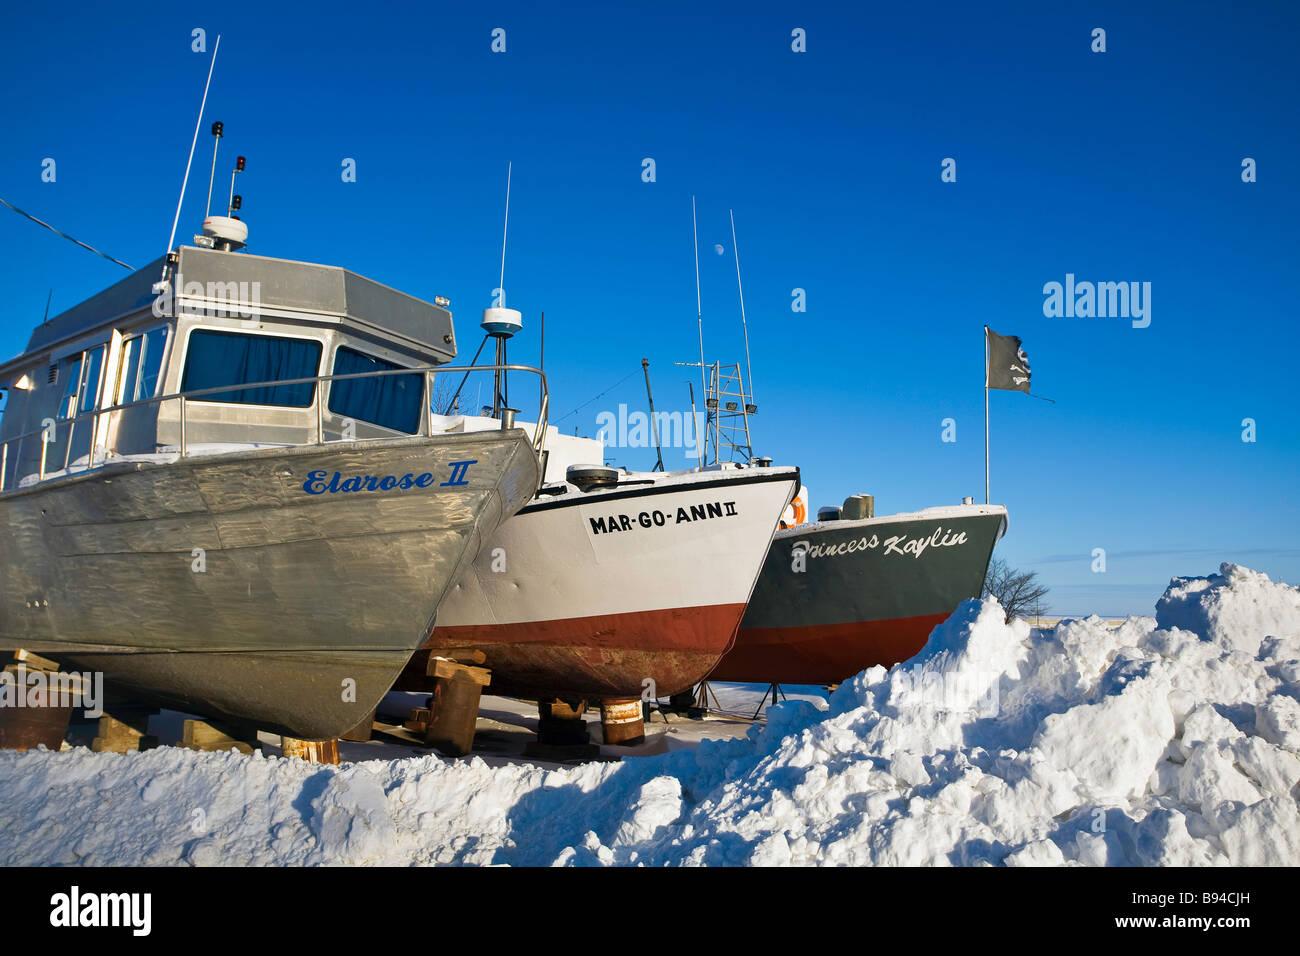 Fishing boats in winter dry dock, Gimli, Manitoba, Canada - Stock Image